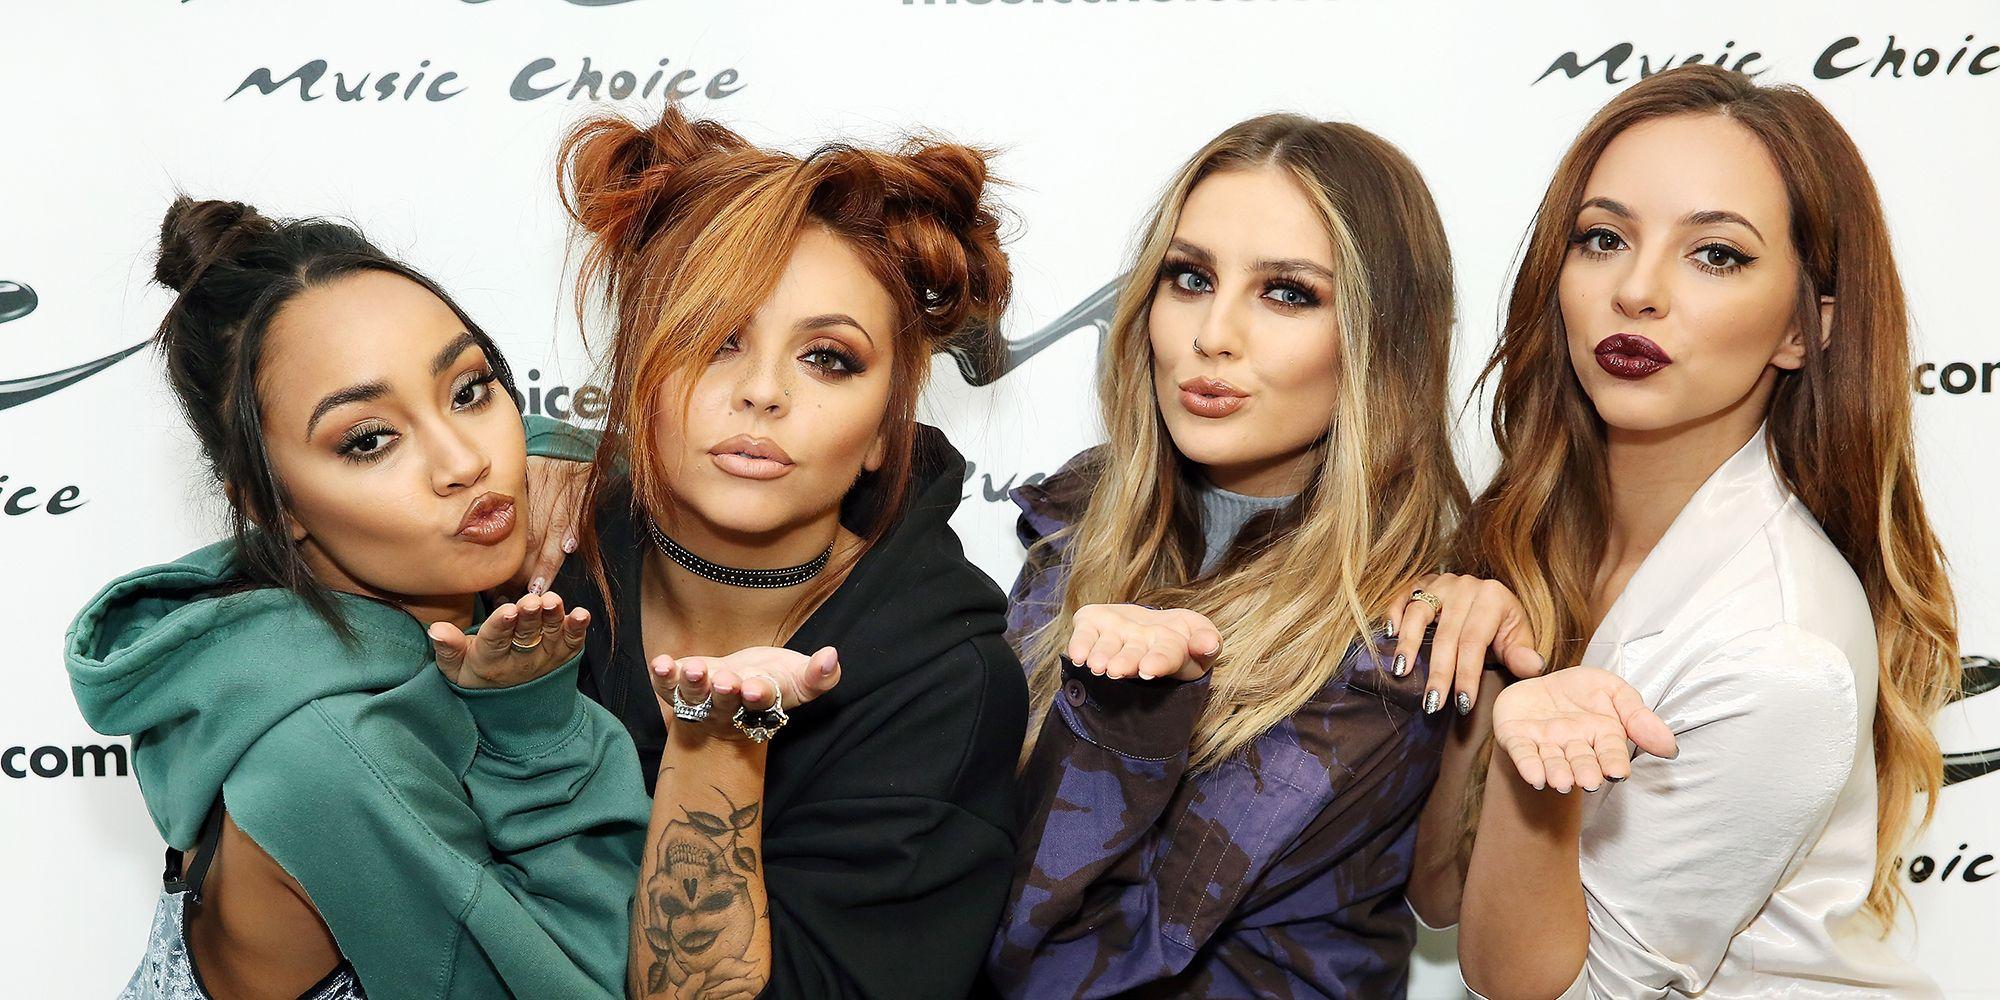 Little Mix Visits Music Choice